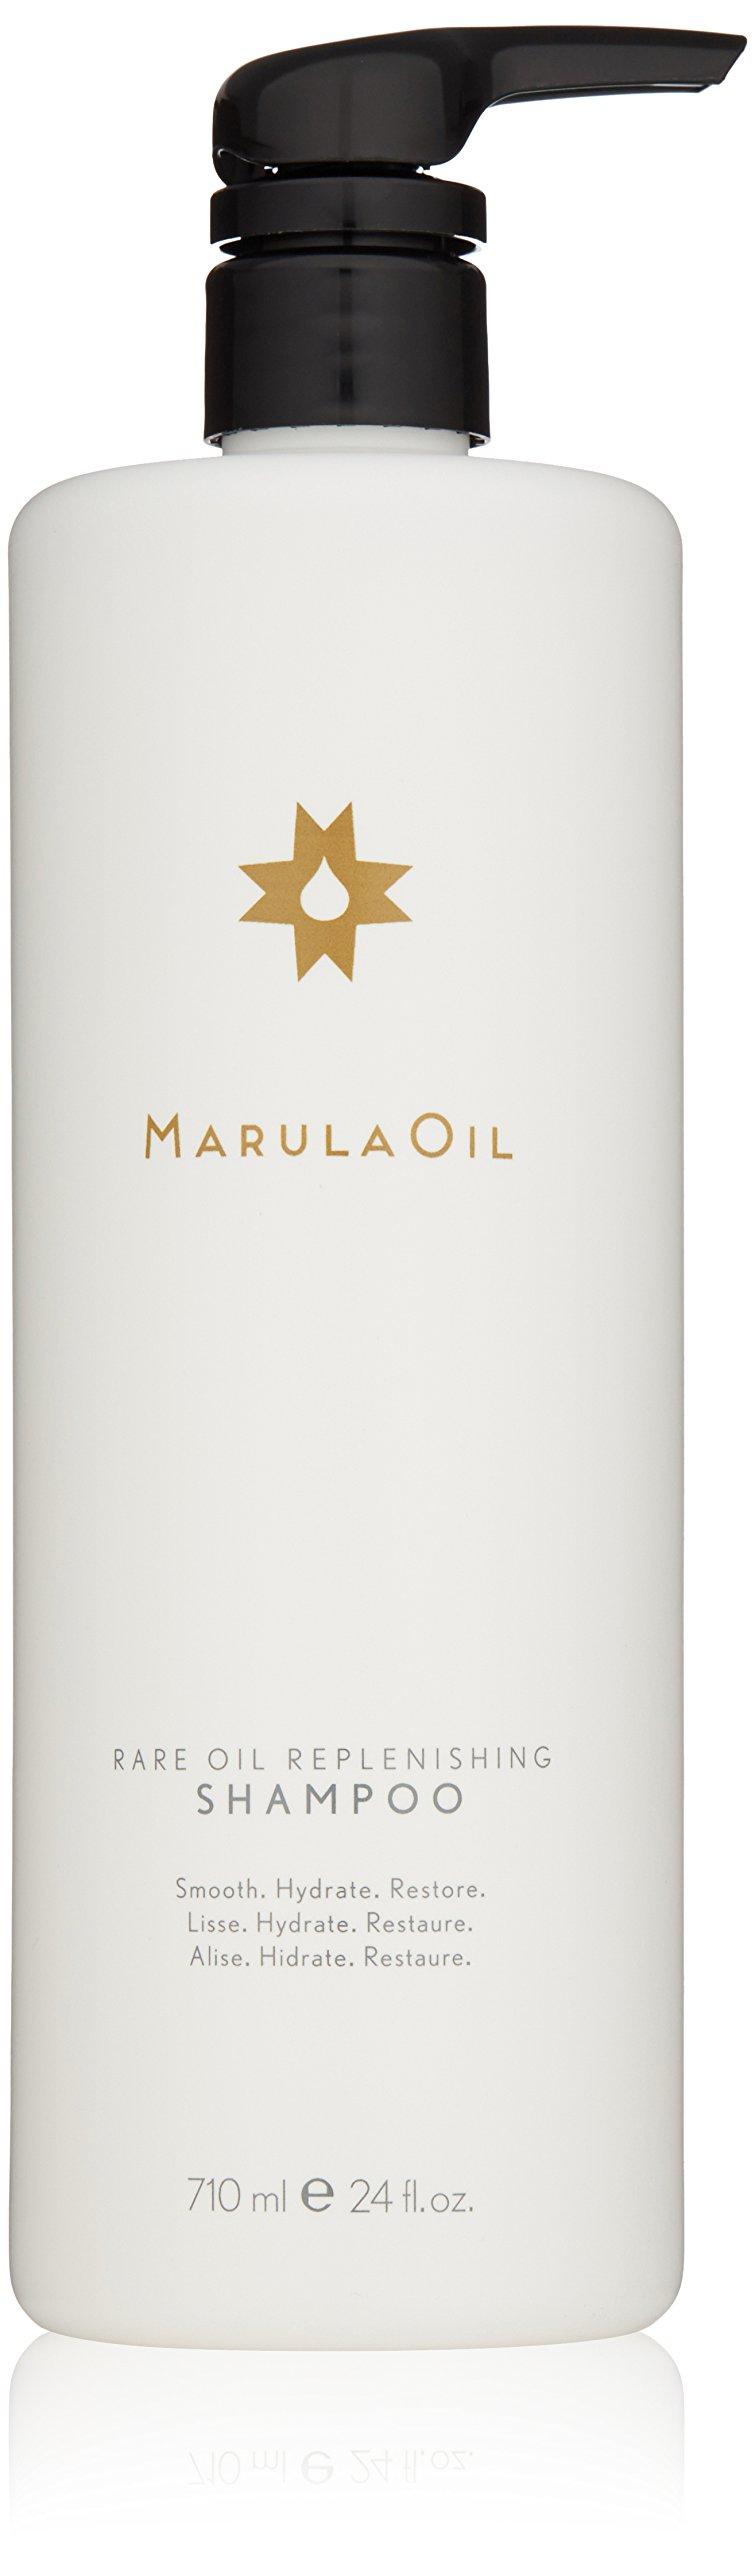 MarulaOil Rare Oil Replenishing Shampoo by MarulaOil (Image #1)